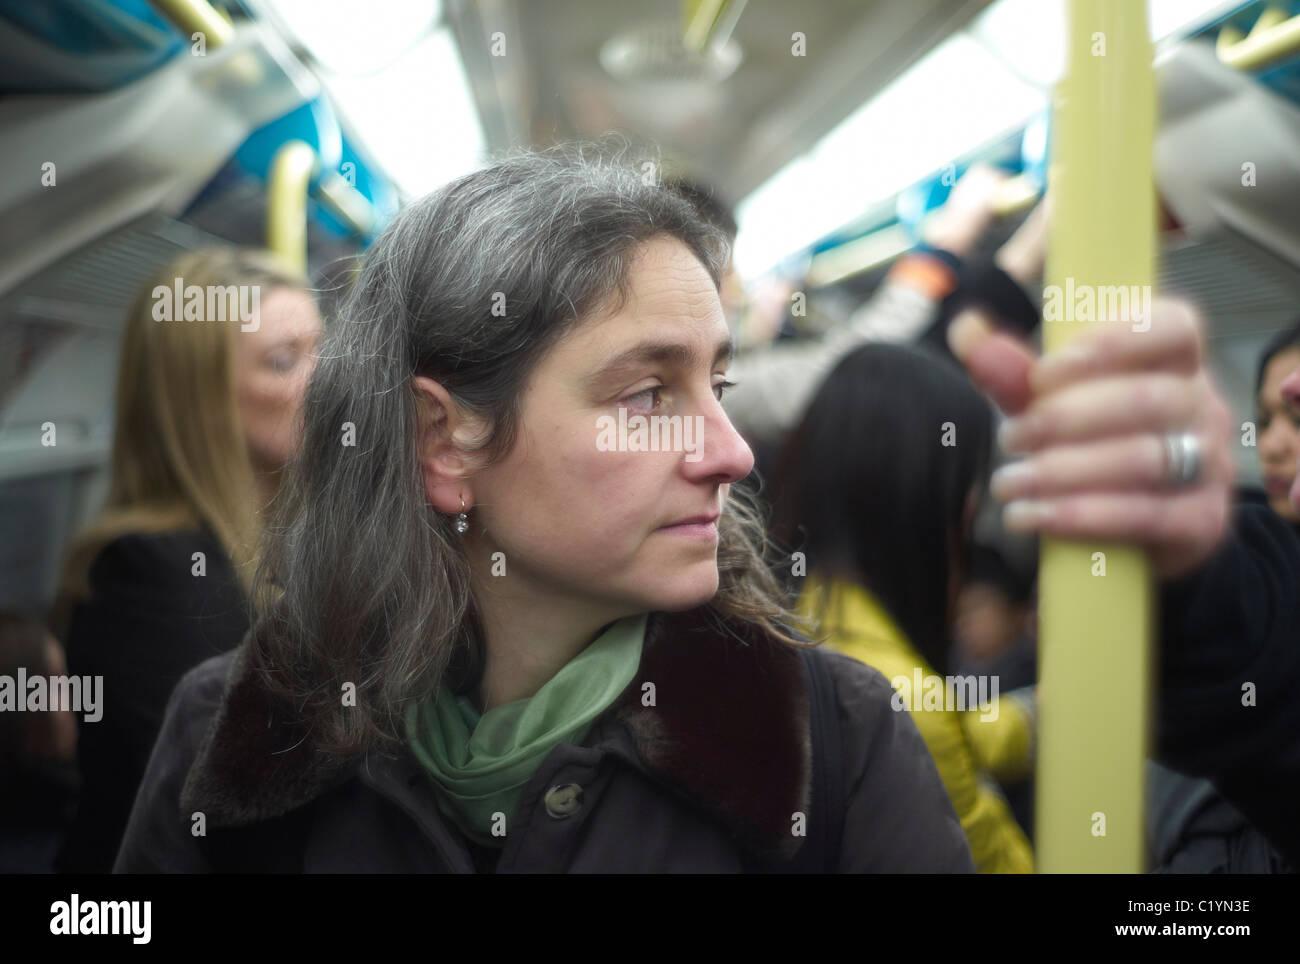 Woman on the London underground or Tube London England - Stock Image